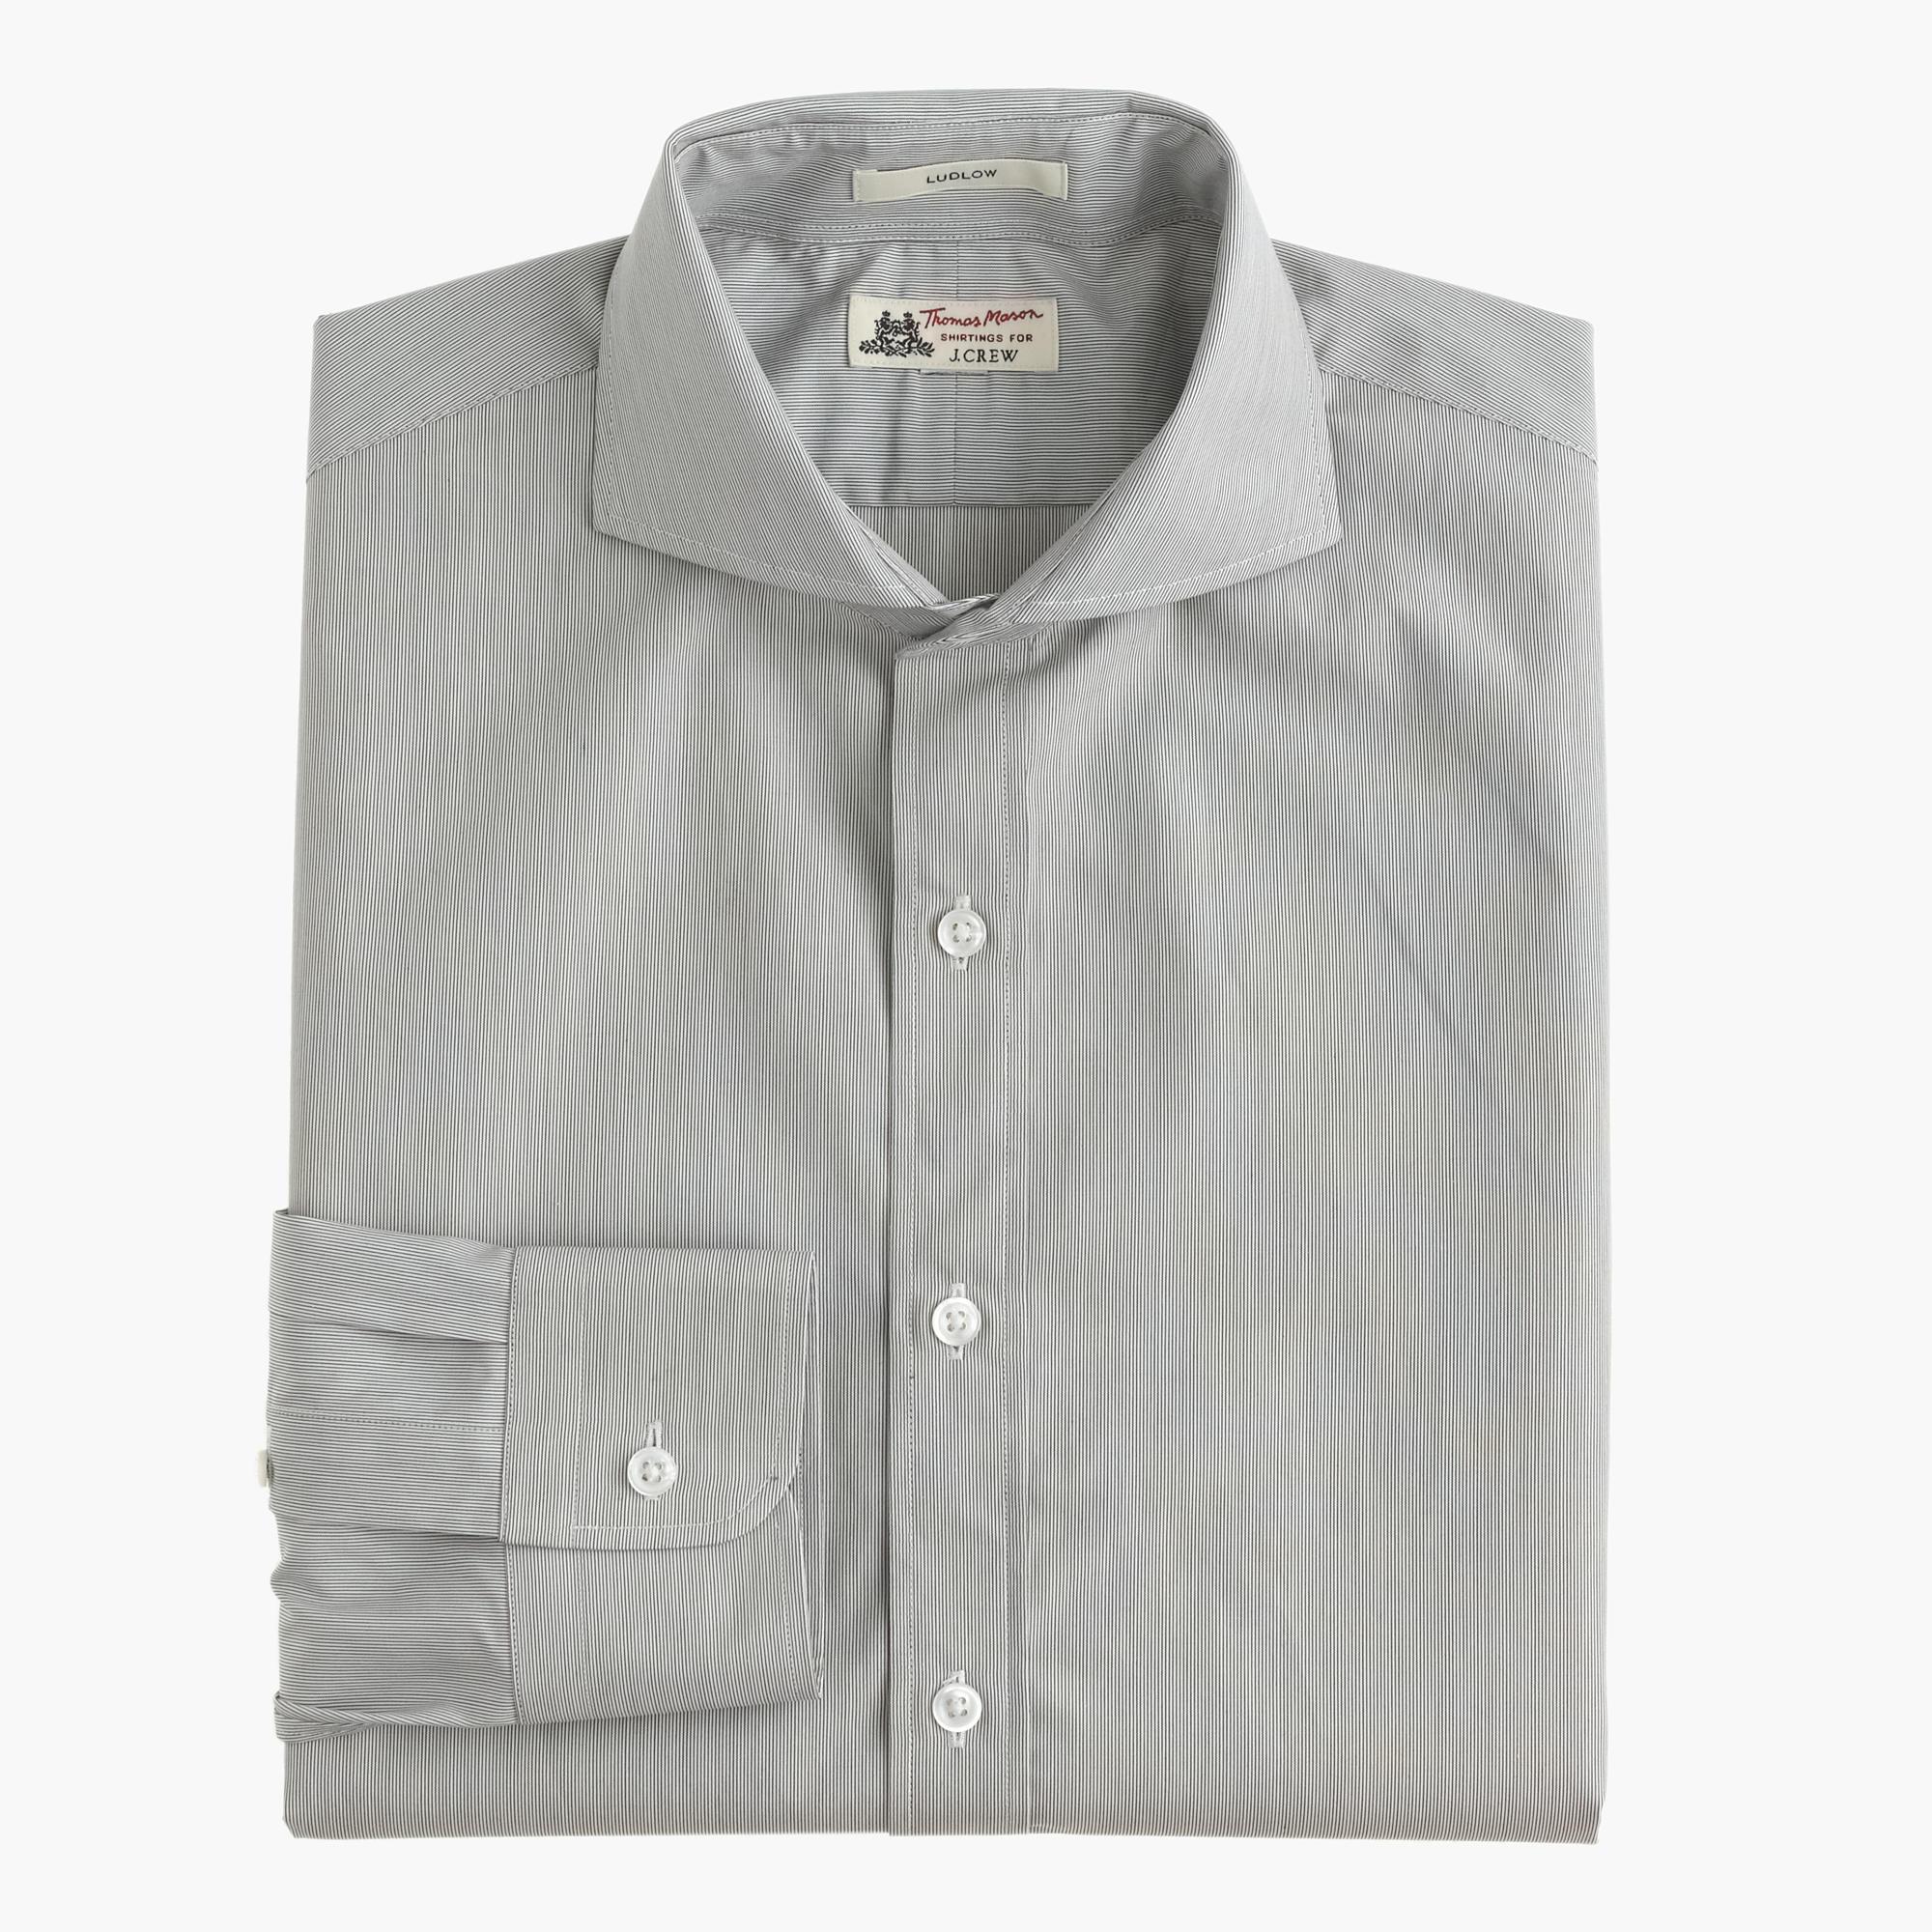 Thomas mason for j crew ludlow cutaway collar shirt in for Thomas mason dress shirts